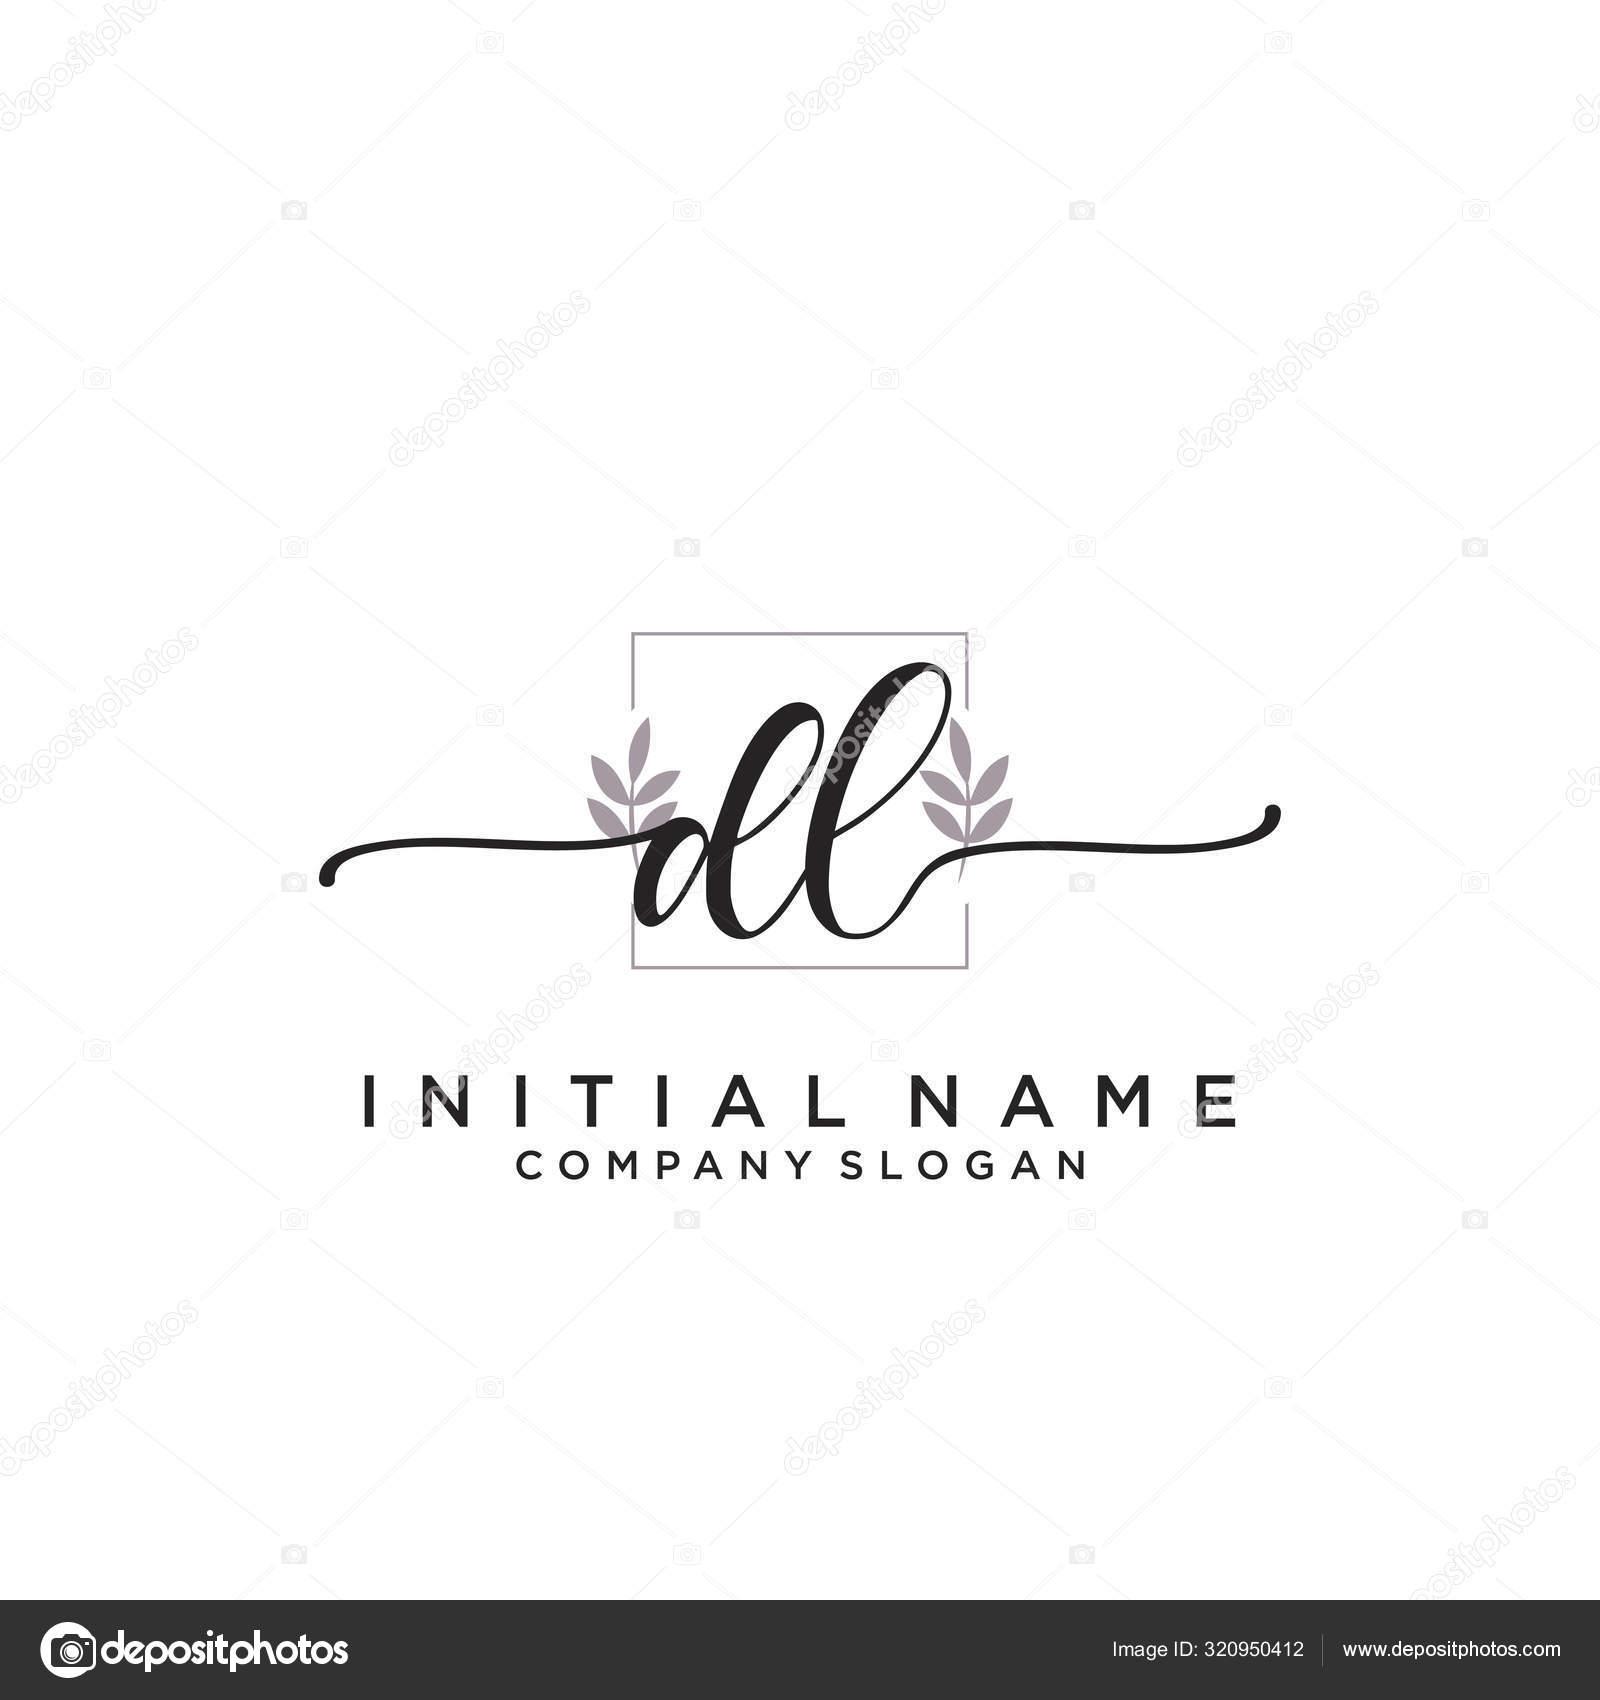 Initial Handwriting Logo Design Logo Fashion Photography Wedding Beauty Business Stock Vector C Xinthink 320950412